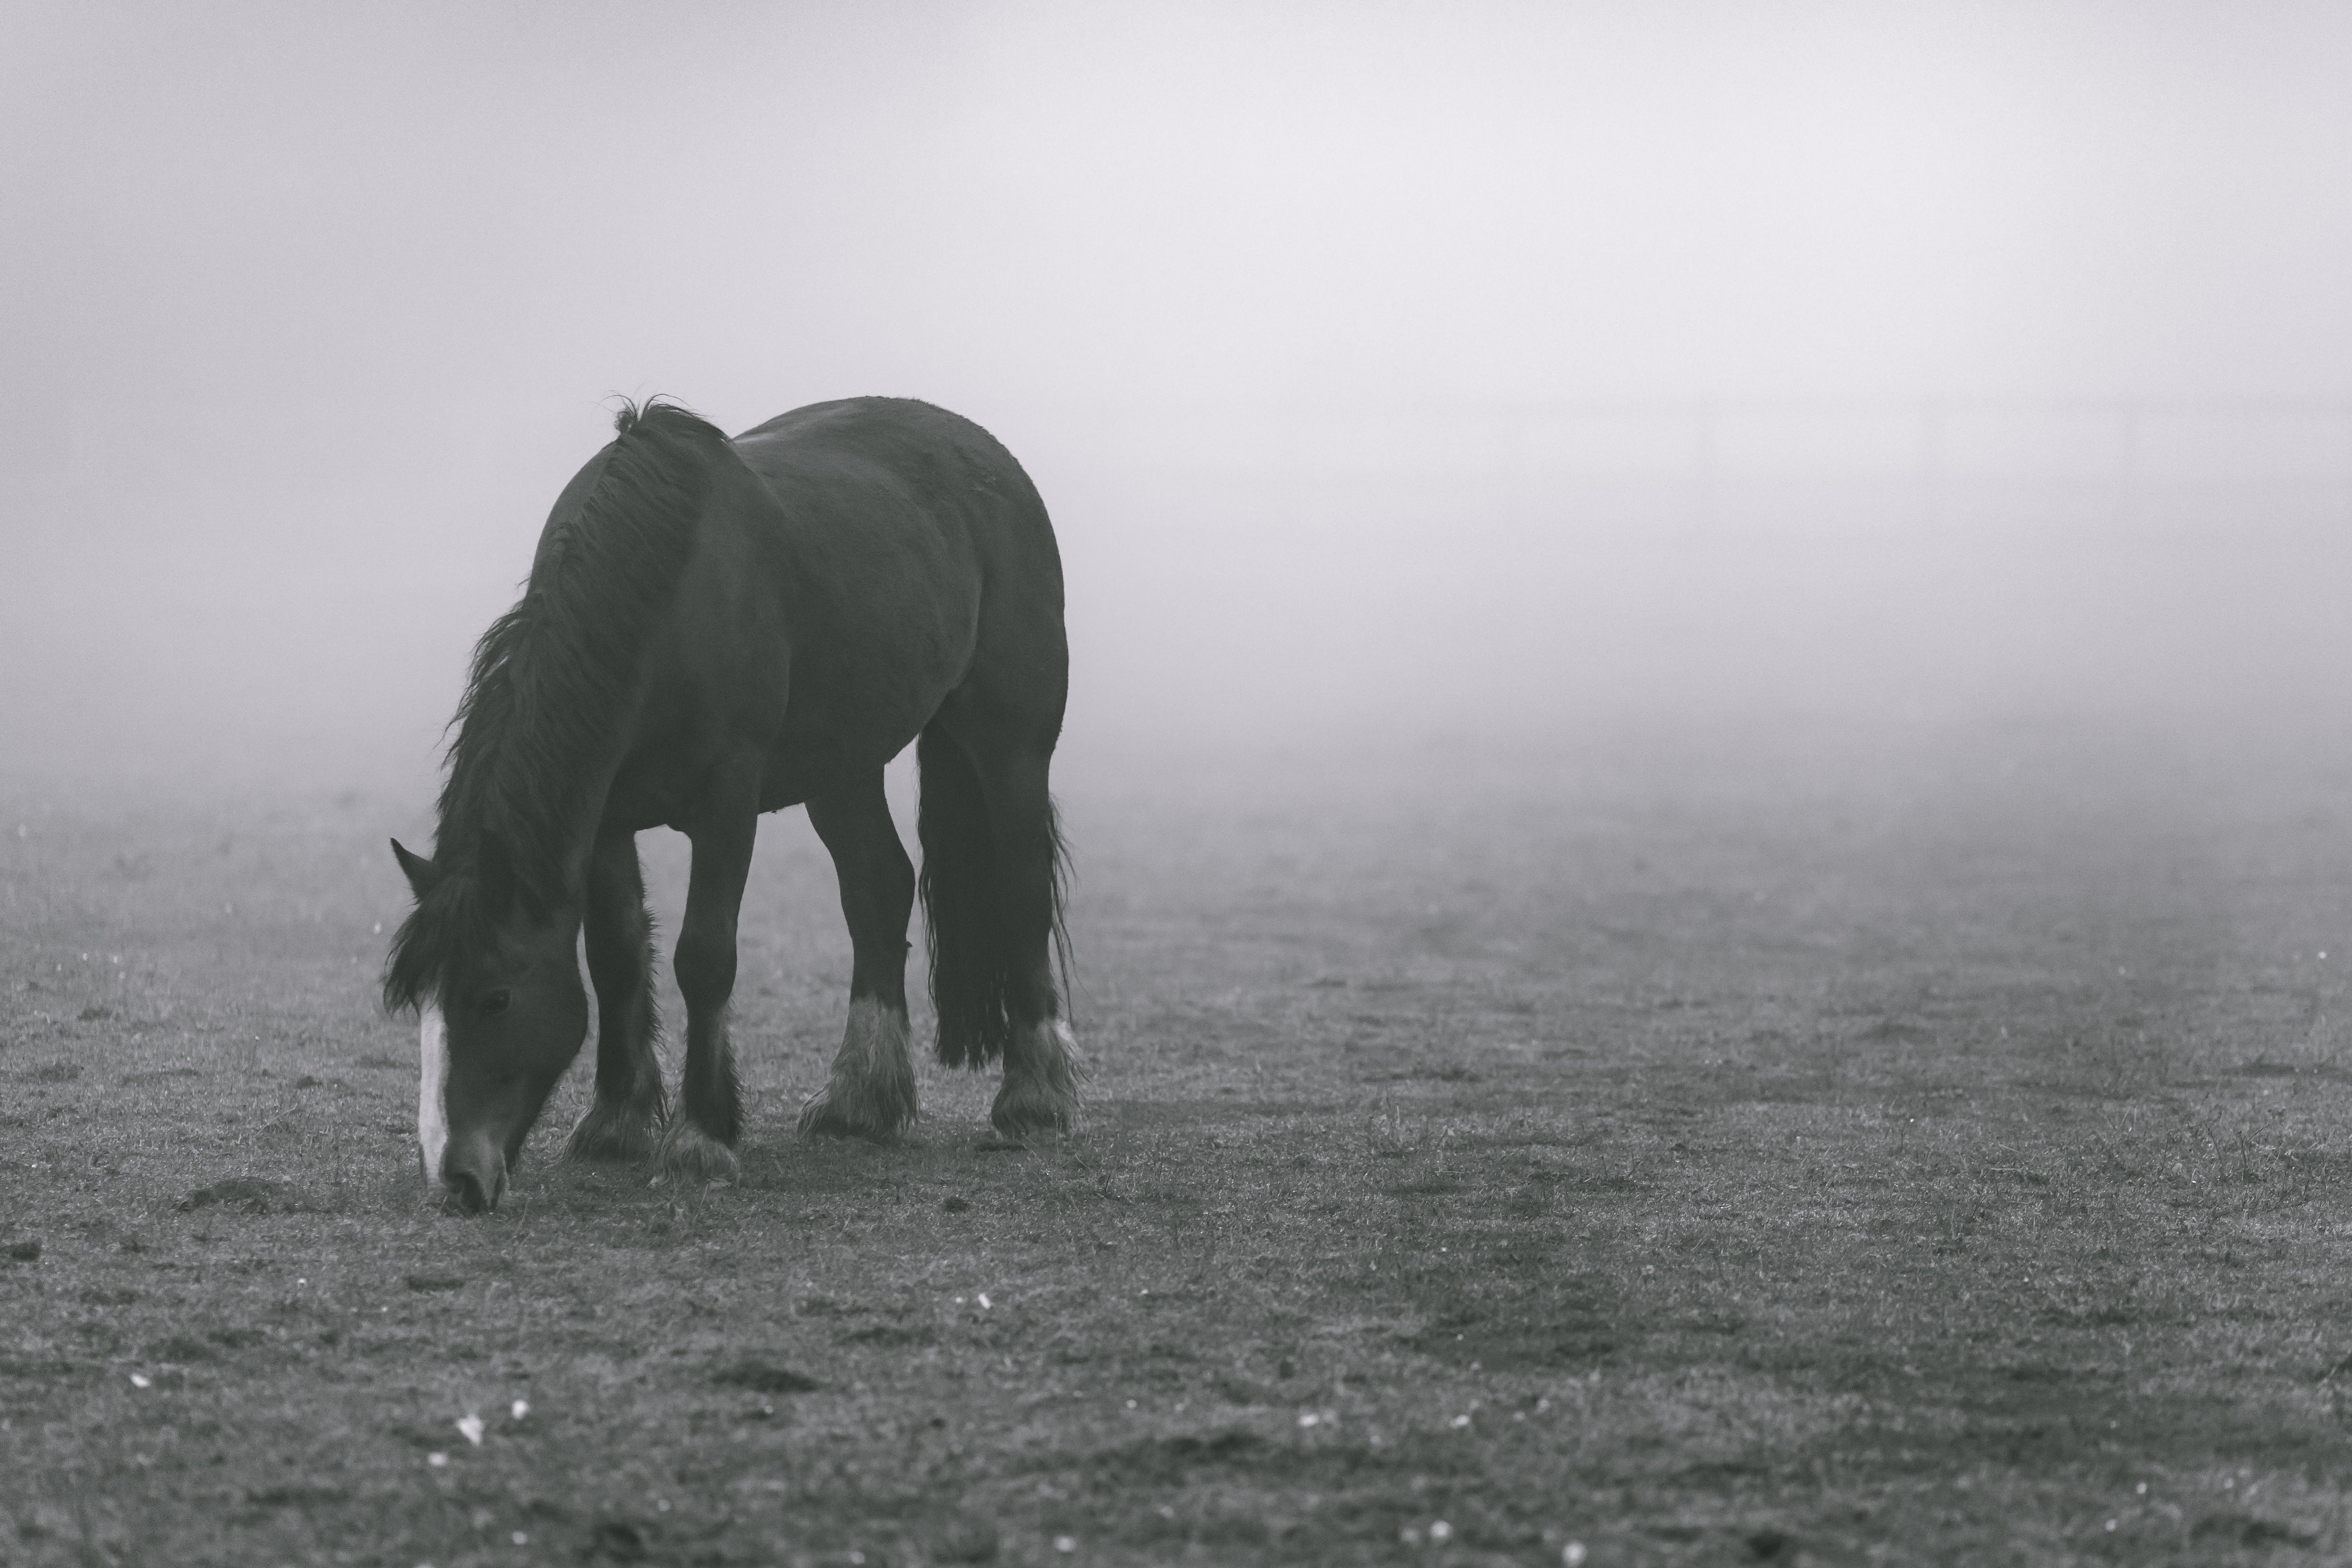 Horse in The Mist, Animals, Black & White, Blackandwhite, Field, HQ Photo